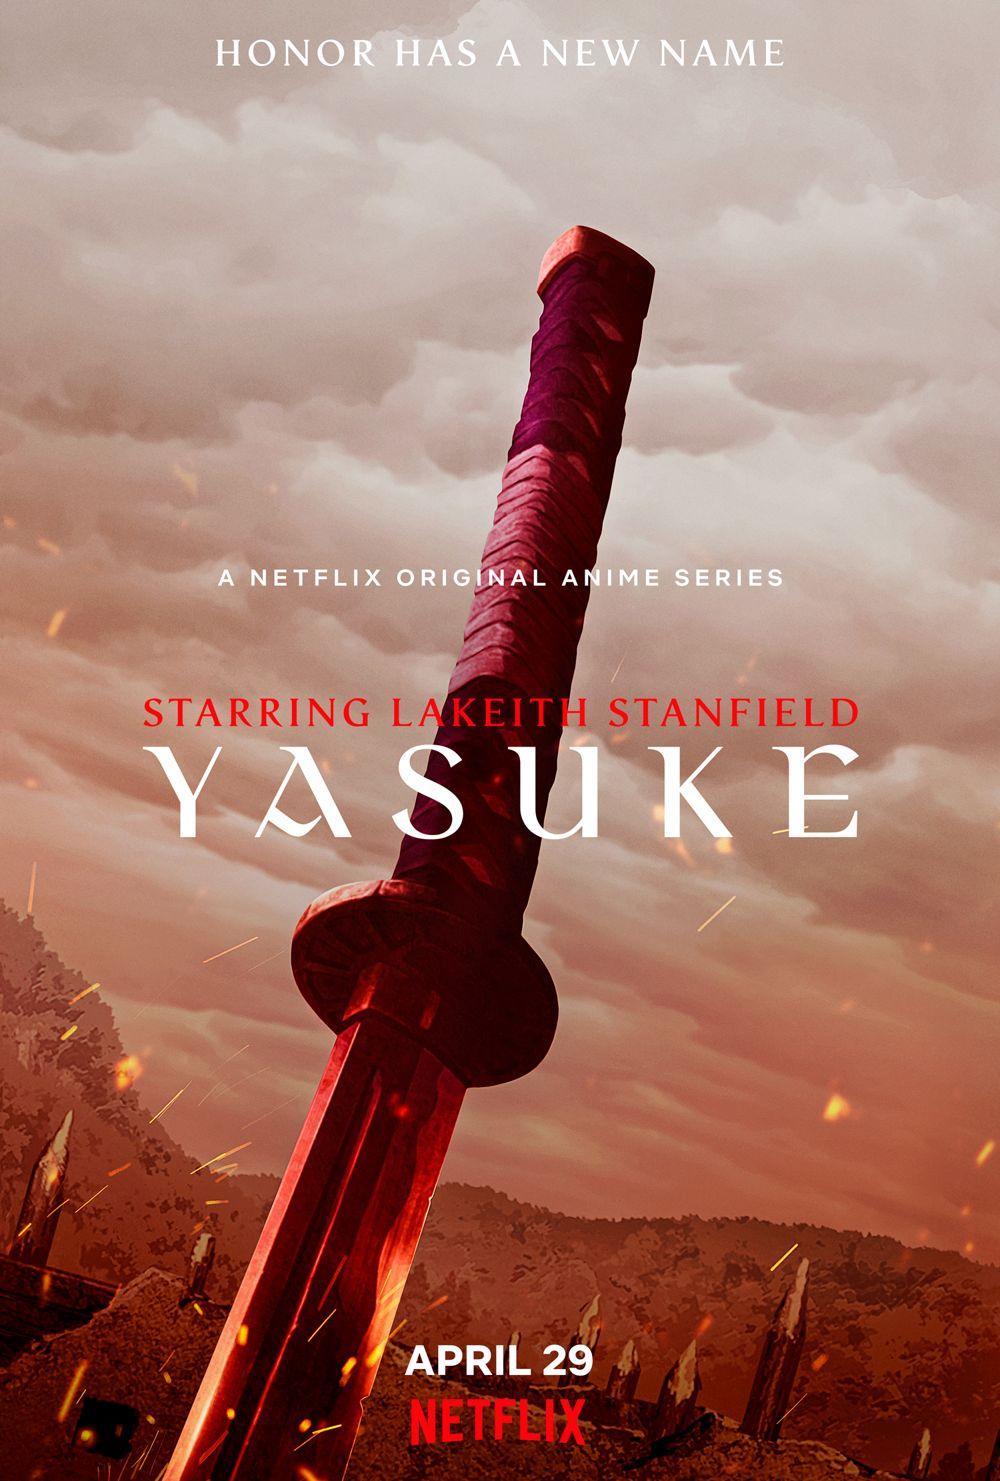 "Yasuke ""width ="" 1000 ""height ="" 1481 ""class ="" size-full wp-image-282666 ""srcset ="" https://www.cartonionline.com/wordpress/wp-content/uploads/2021/04/Teaser-L39epico-39Yasuke39-di-Black-Samurai-svela-una-nuova-era-su-Netflix.jpg 1000w, https://www.animationmagazine.net/wordpress/wp-content/uploads/Yasuke2-1-162x240.jpg 162w, https://www.animationmagazine.net/wordpress/wp-content/uploads/Yasuke2-1 -675x1000.jpg 675w, https://www.animationmagazine.net/wordpress/wp-content/uploads/Yasuke2-1-768x1137.jpg 768w ""sizes ="" (larghezza massima: 1000px) 100vw, 1000px ""/>  <p class="